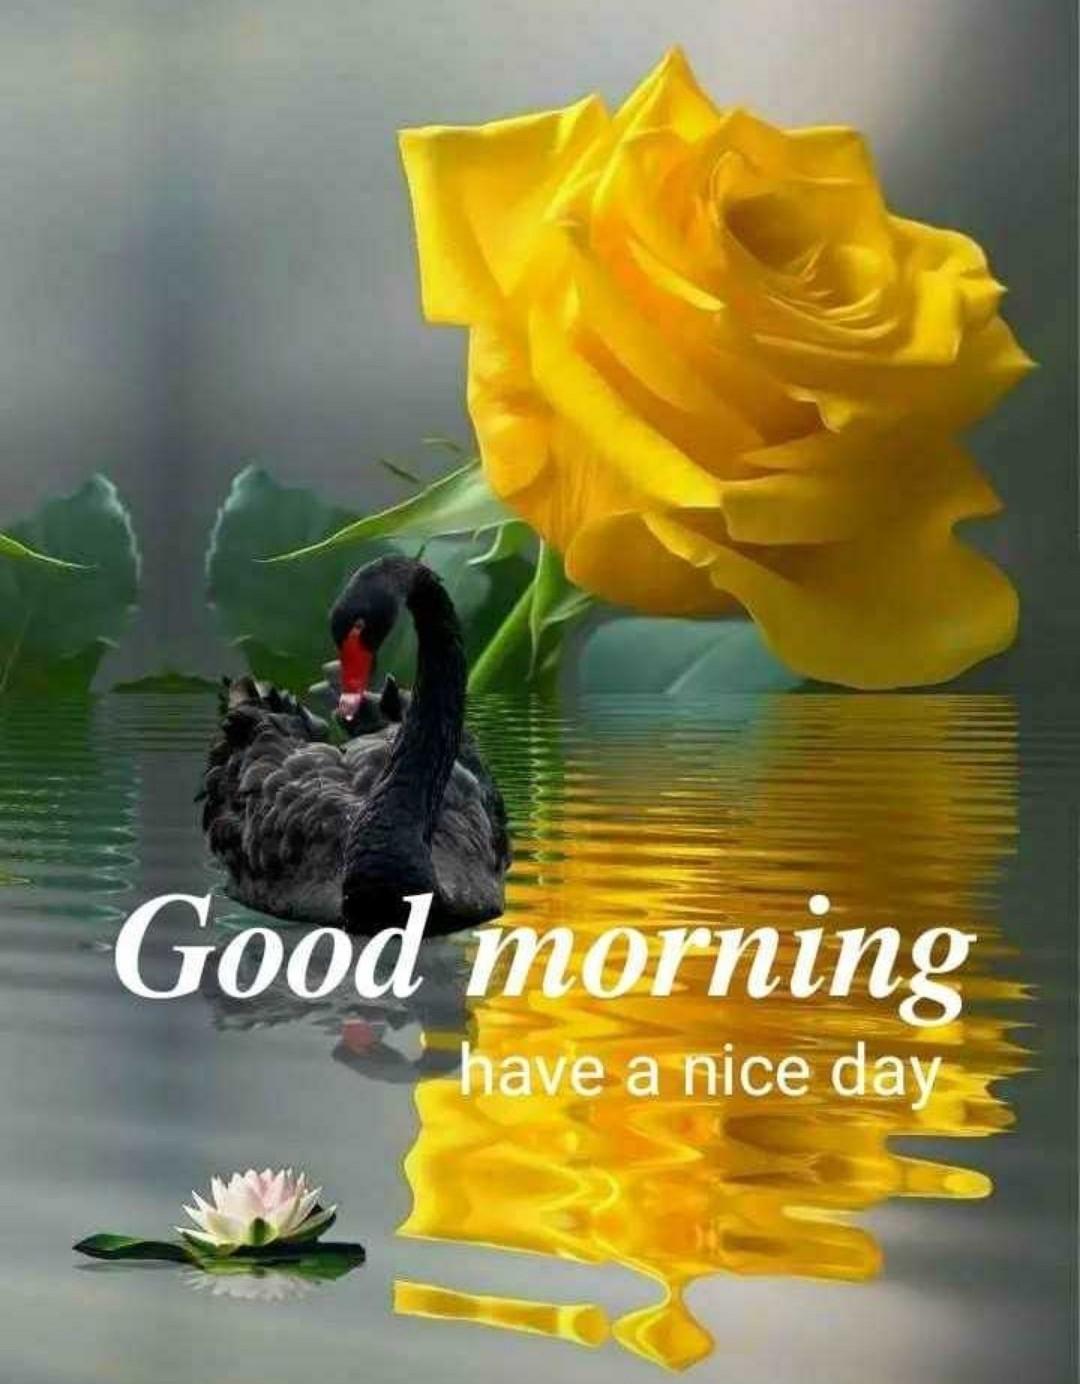 New 631 Good Morning Image - Good Morning Black Rose Hd - HD Wallpaper